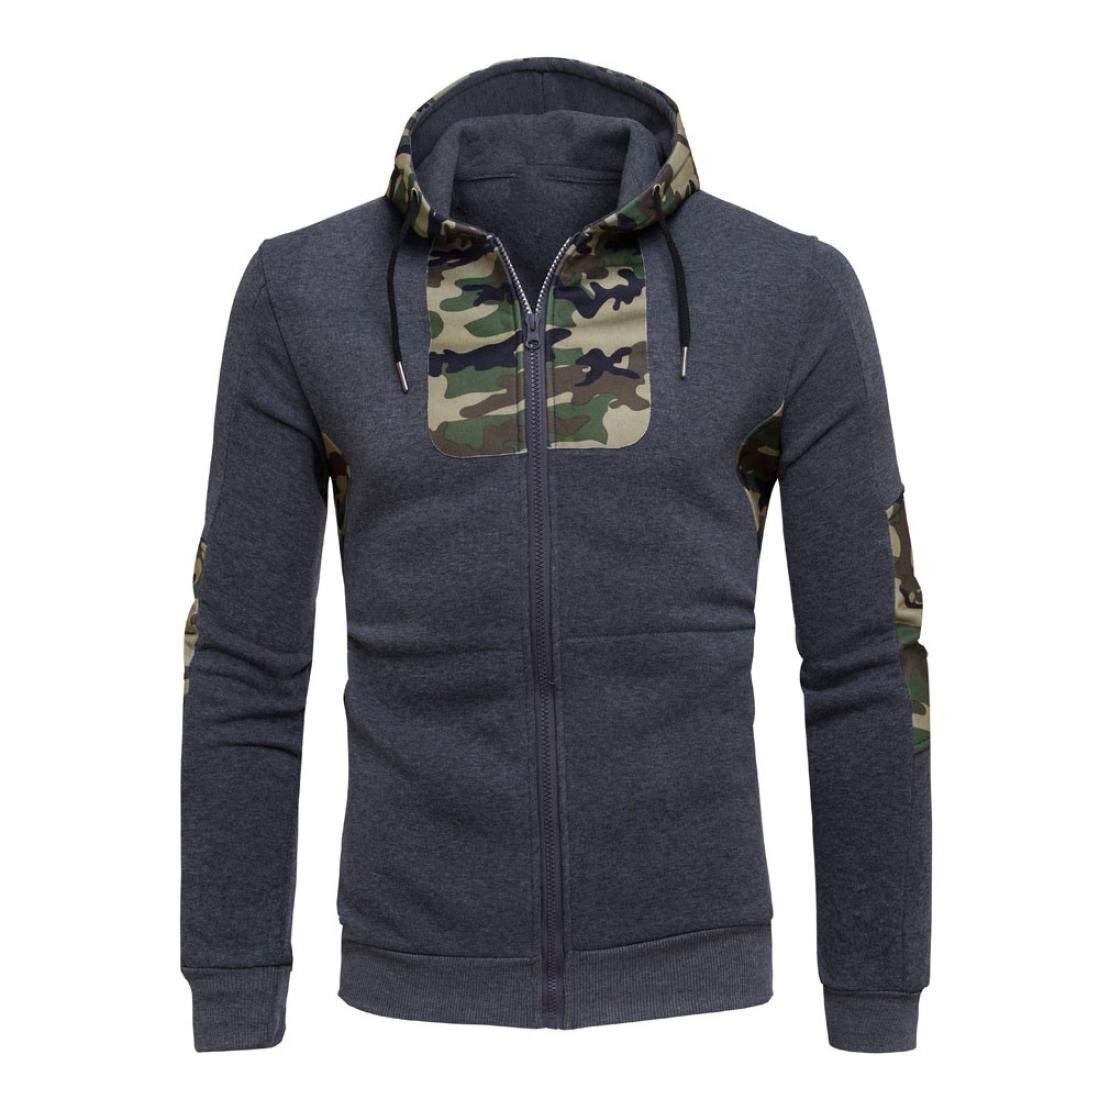 Sharemen Camouflage Hoodie Mens' Autumn Winter Slim Fit Sweatshirt Coat